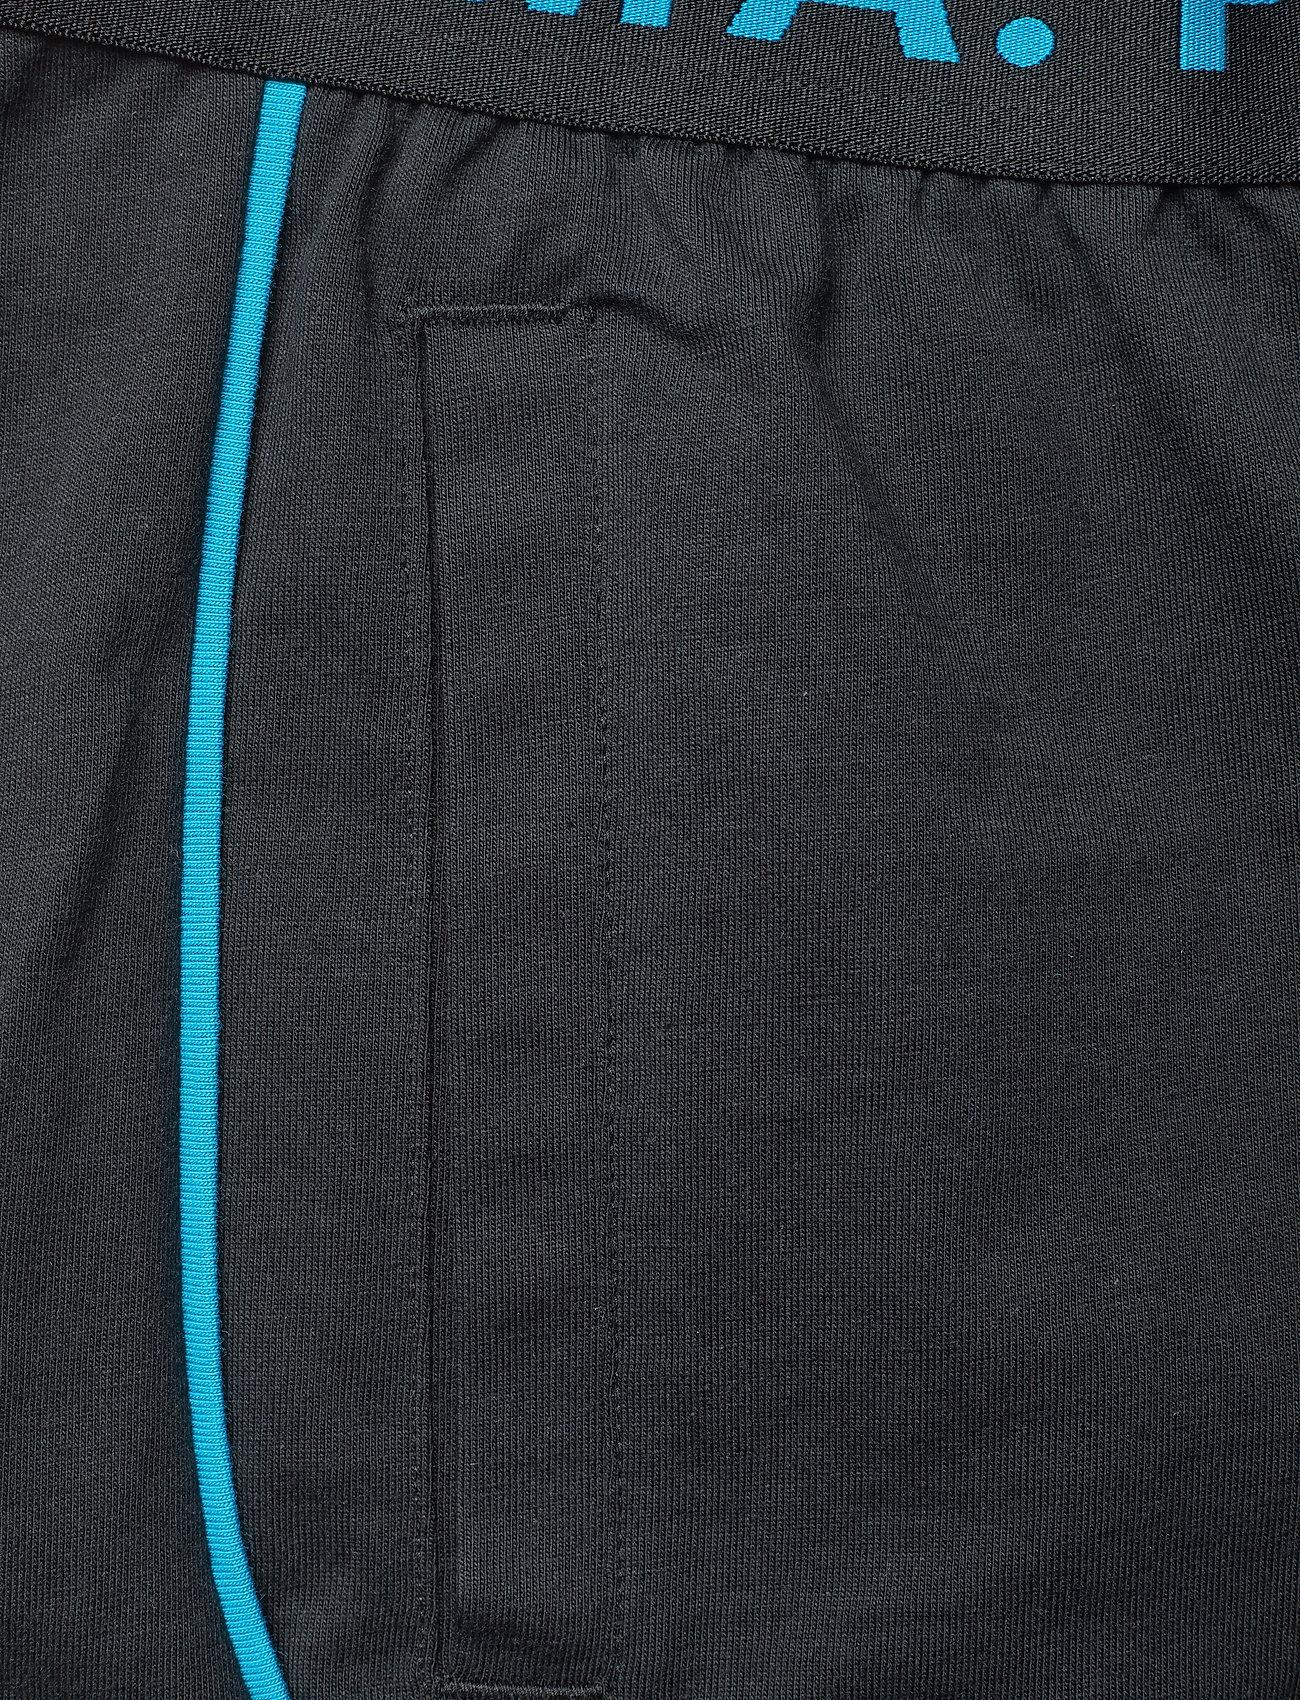 Chase Shorts (Cotton Black-caribbean Sea) (160 kr) - PUMA